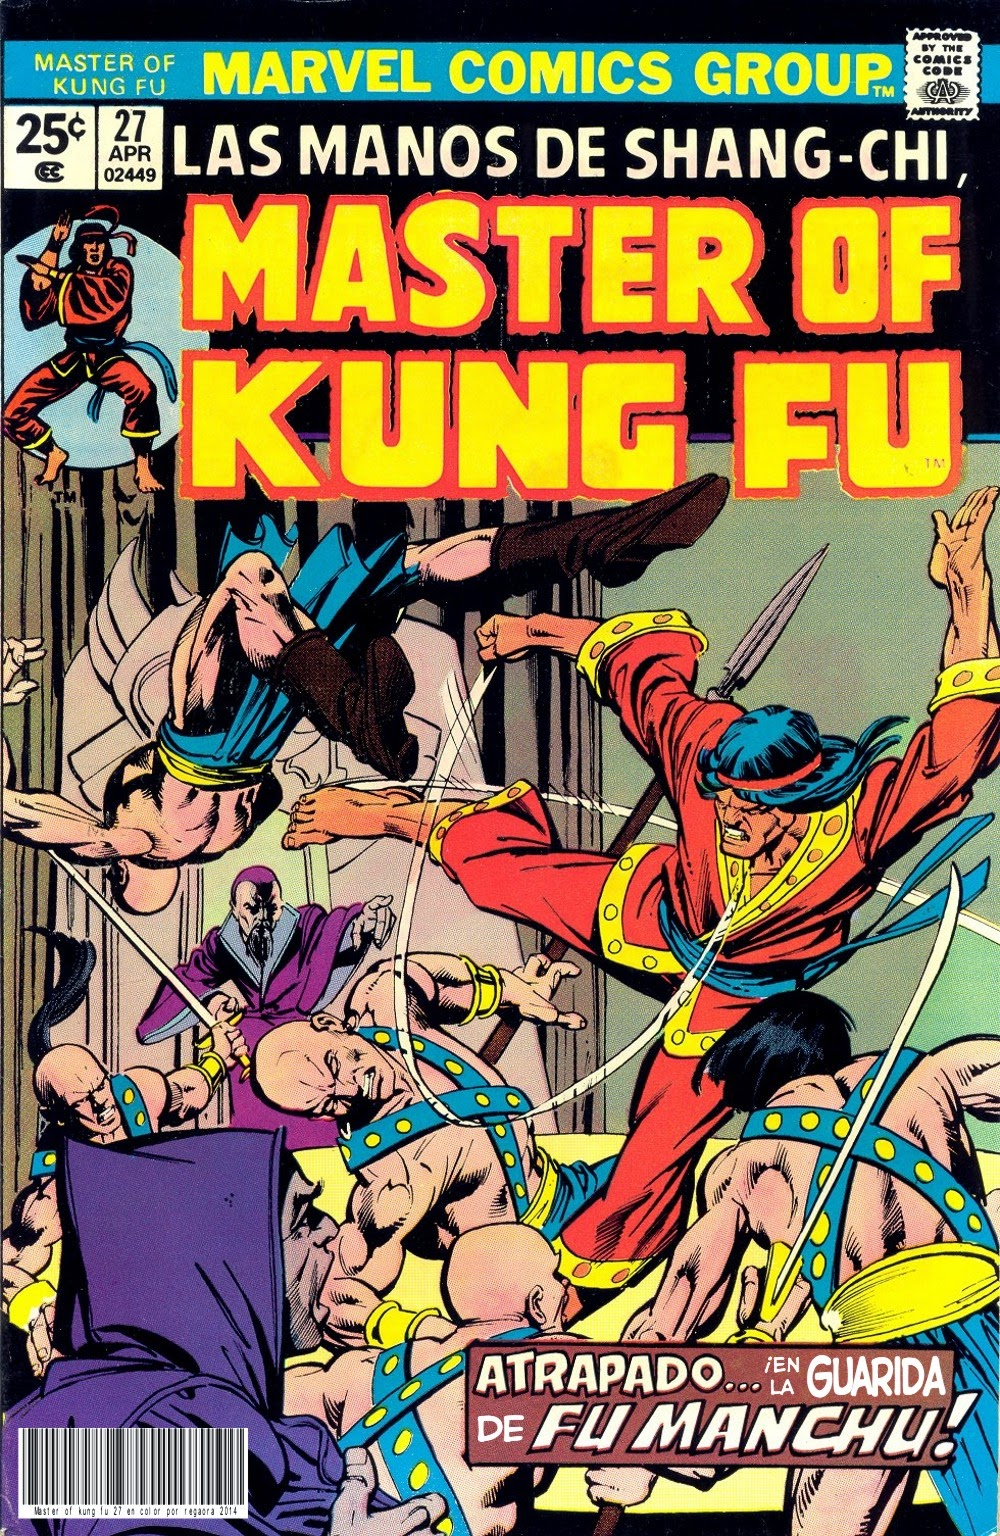 Portada de Master of Kung Fu Nº 27 traducido